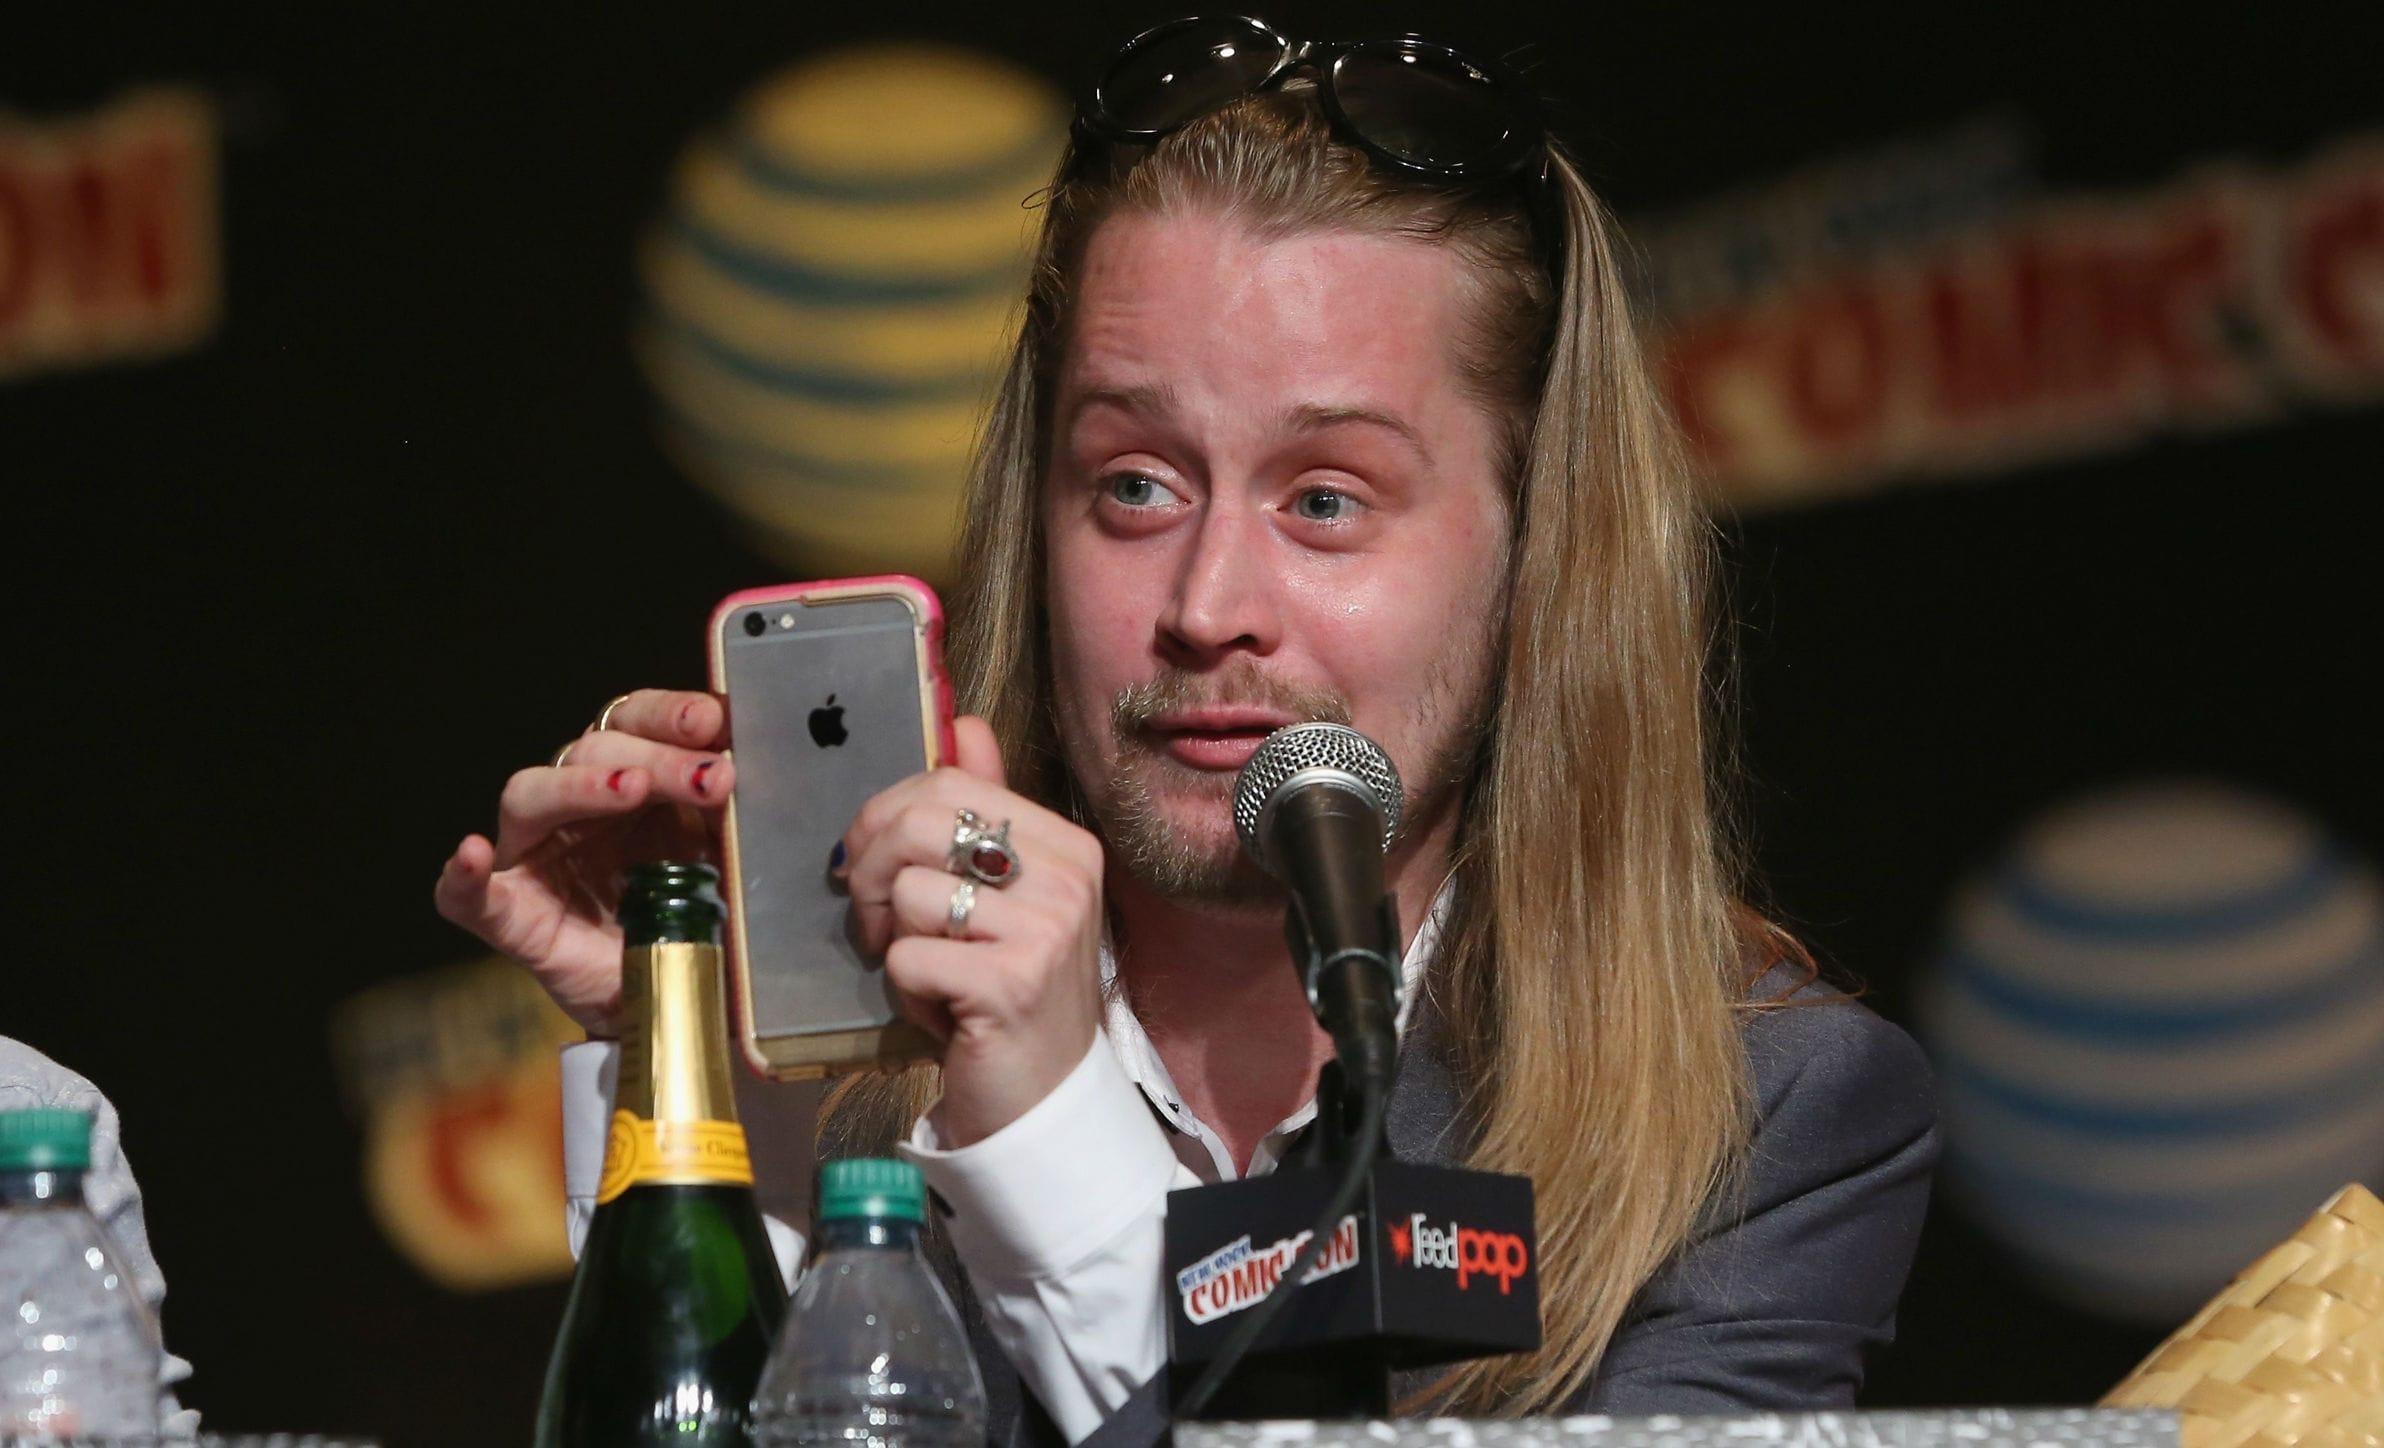 Macaulay Culkin Backgrounds